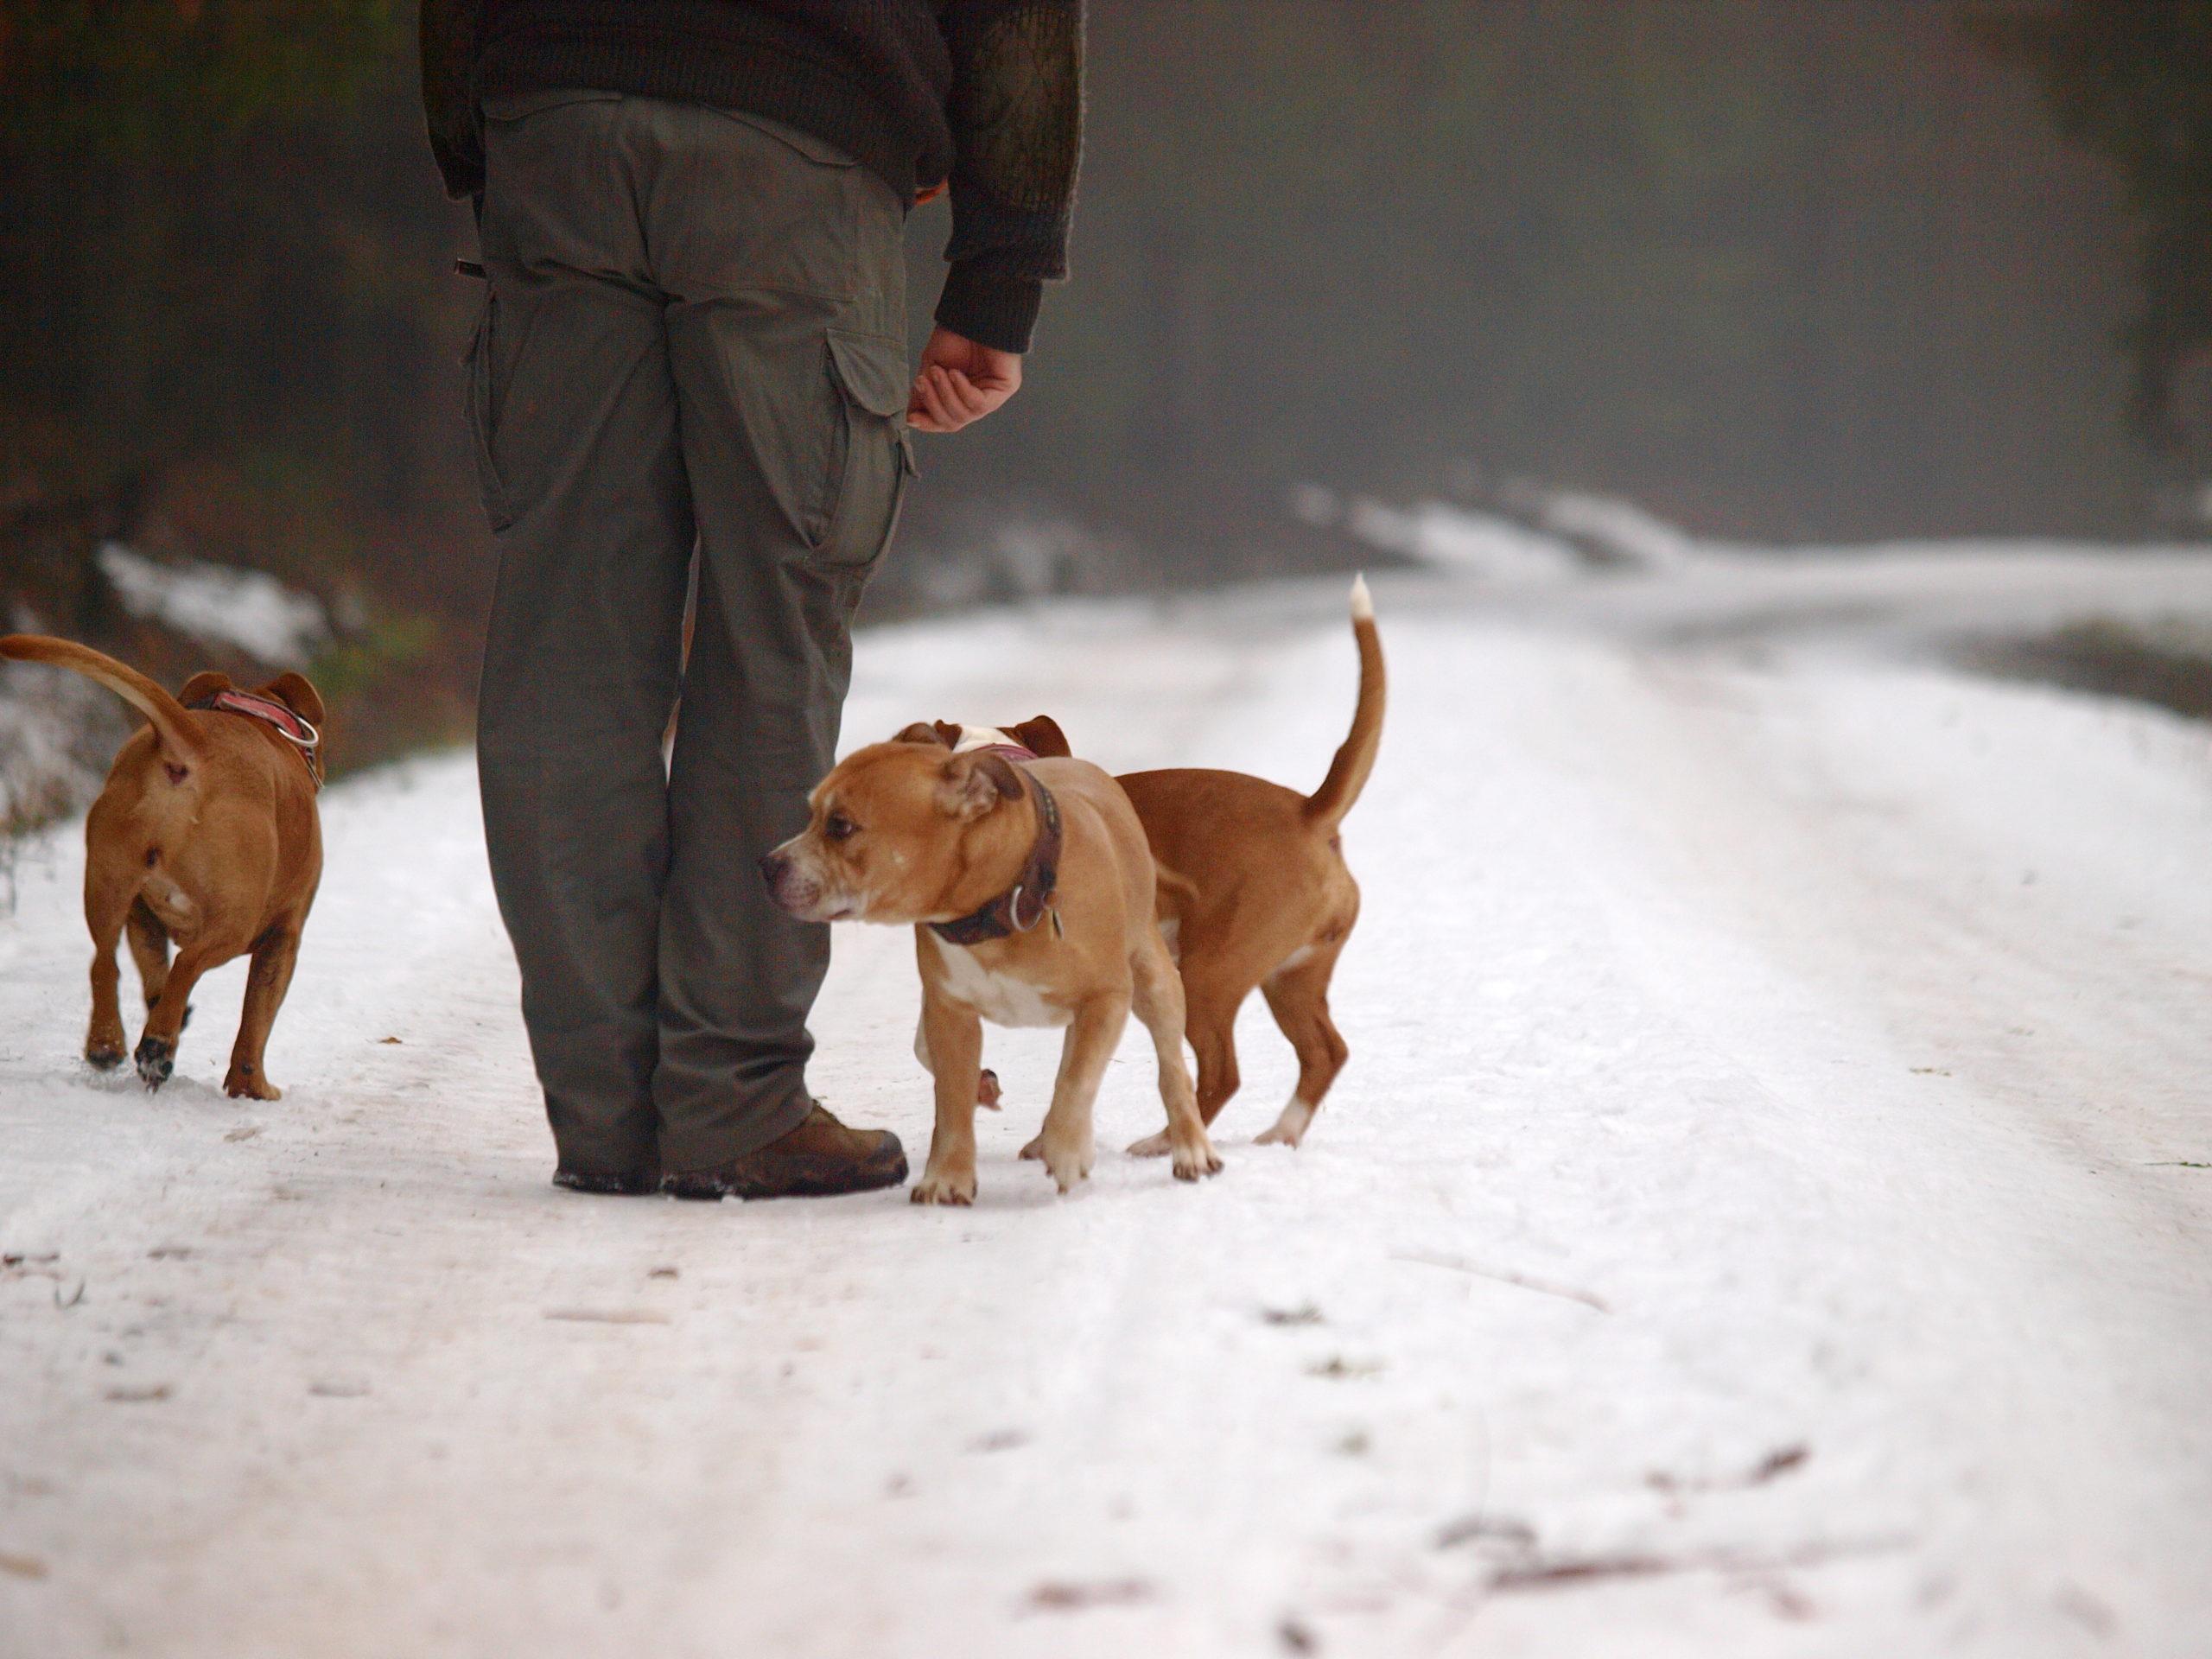 Stafforshire Bull Terrier de Orphanus